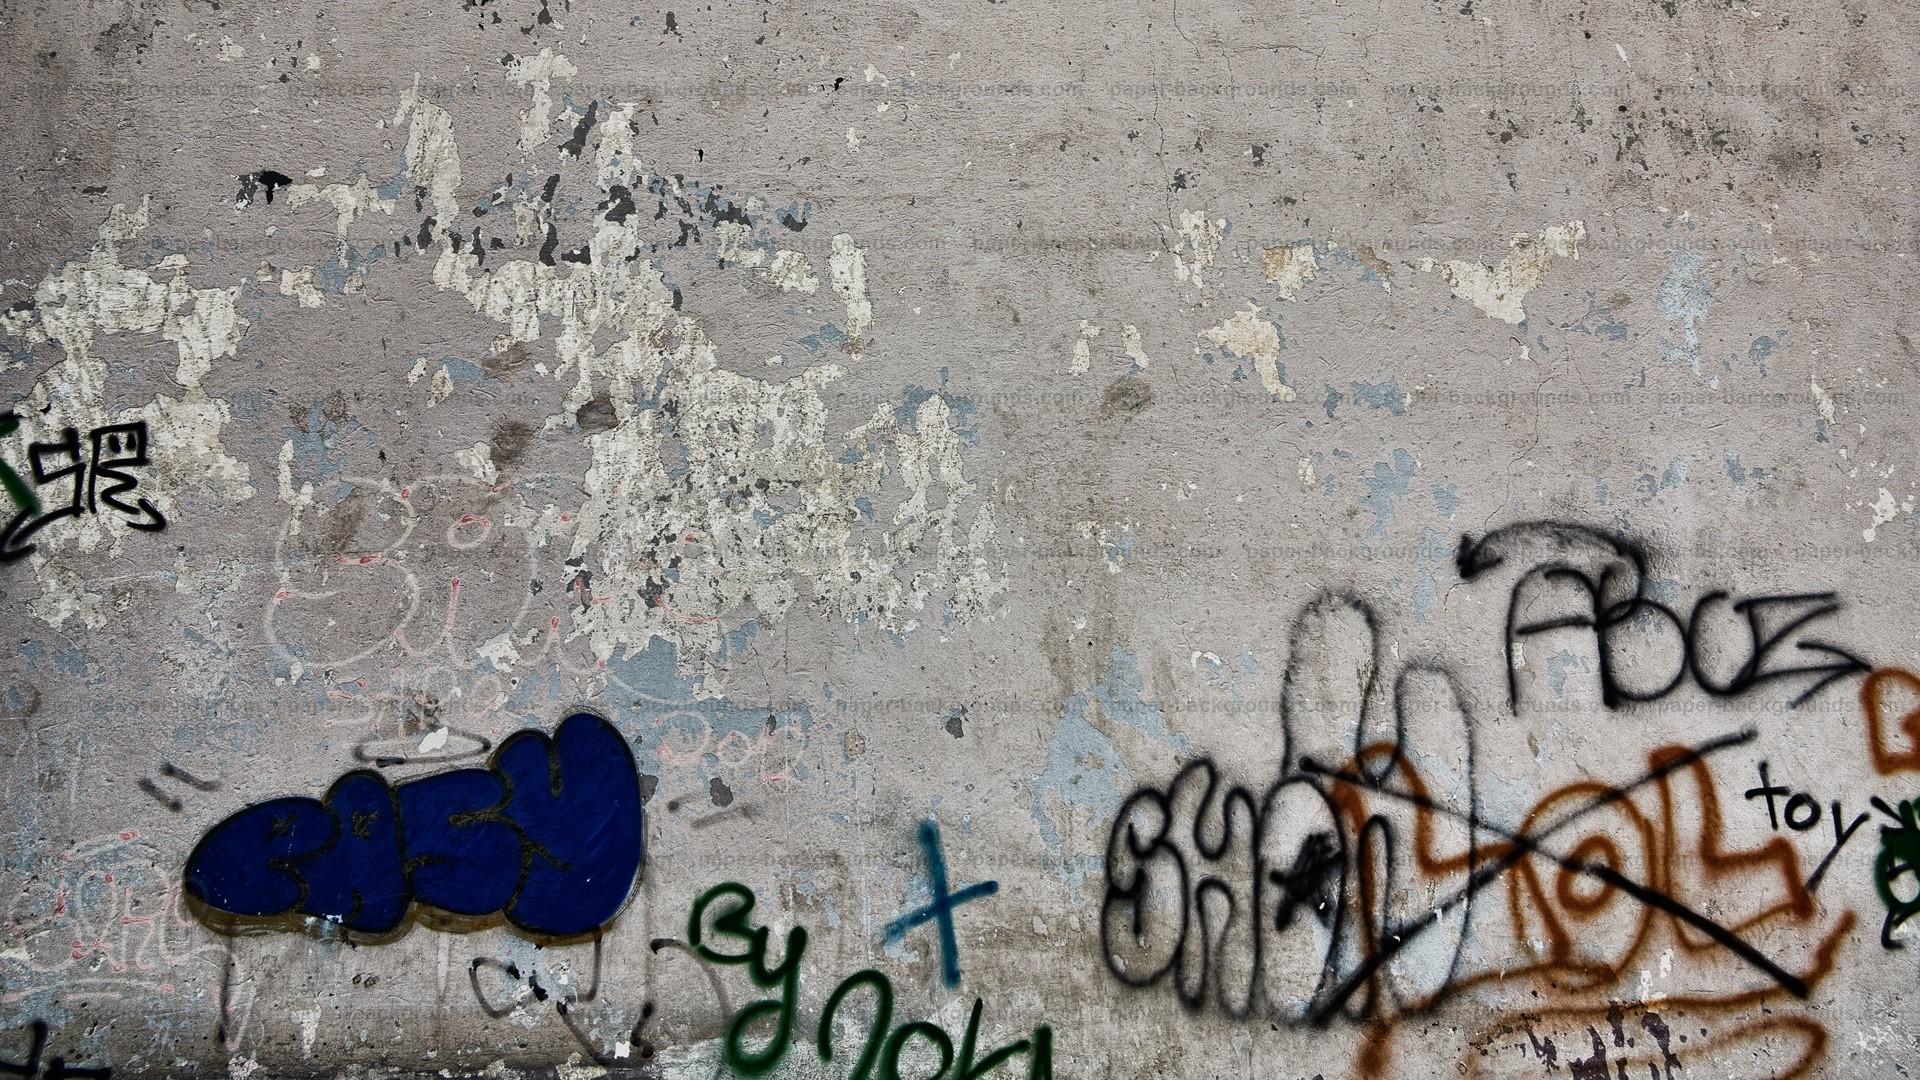 wall street wallpaper hd (69+ images)